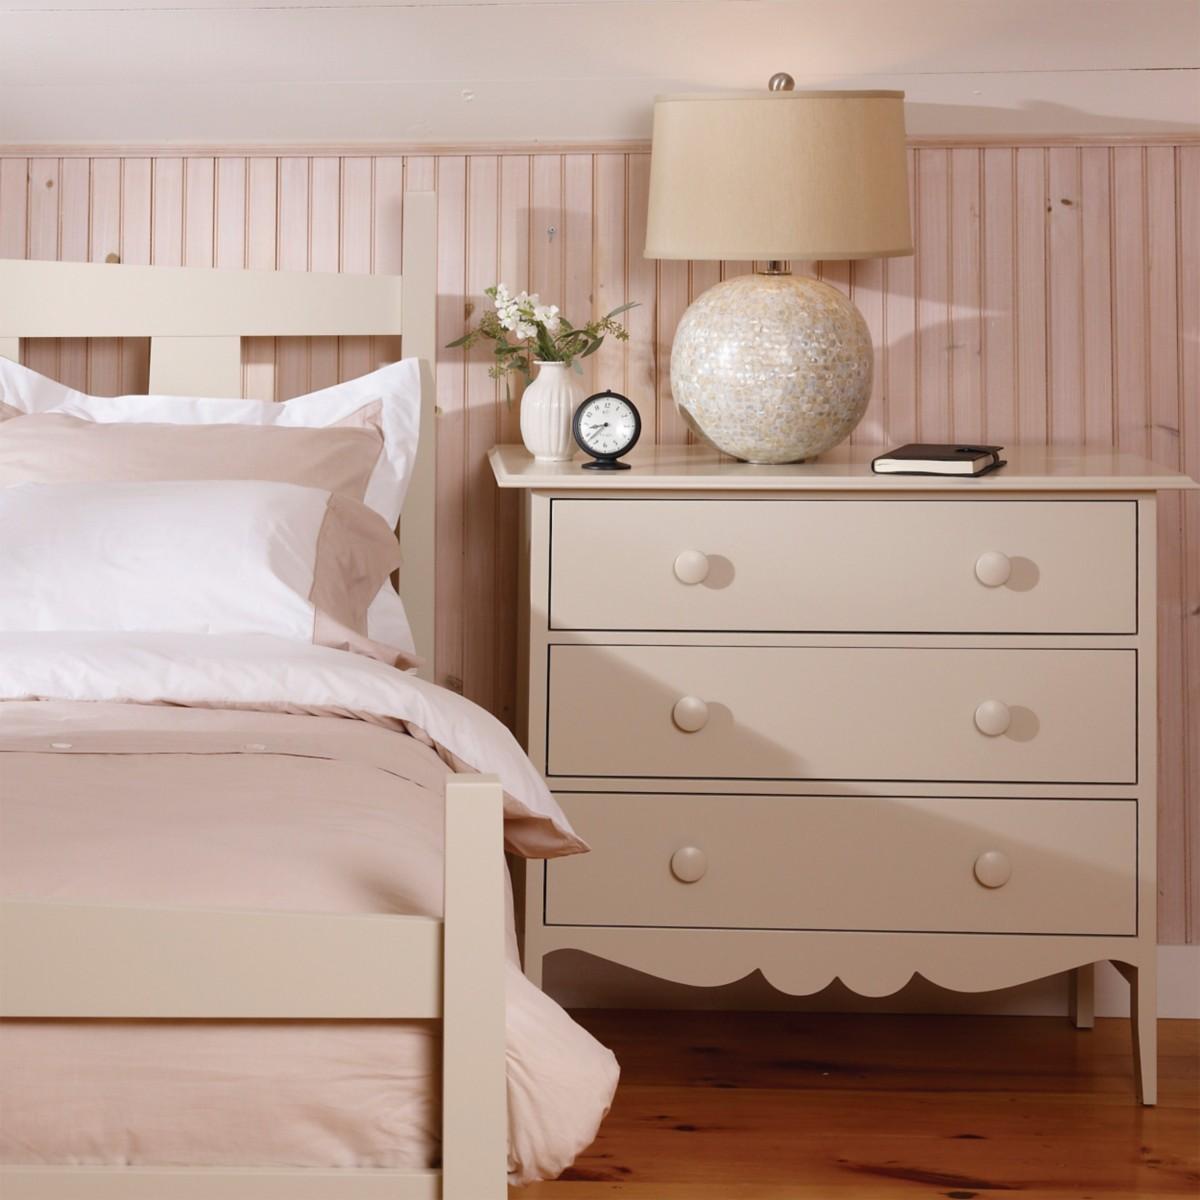 for dresser drawer o kit verlays overlays hemnes product pippa ikea